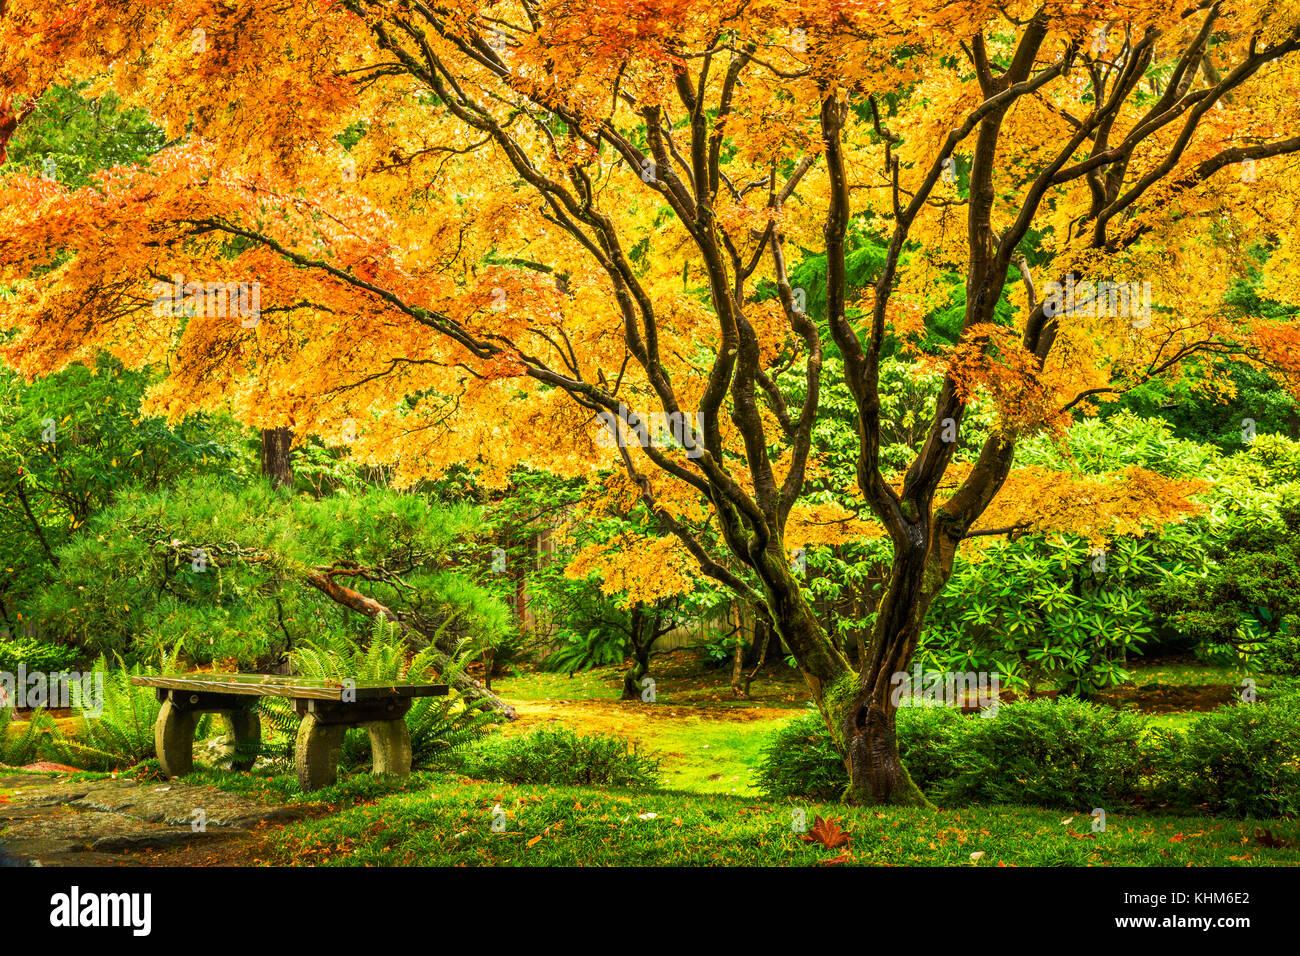 Japanese Maple Tree Stock Photos & Japanese Maple Tree Stock Images ...